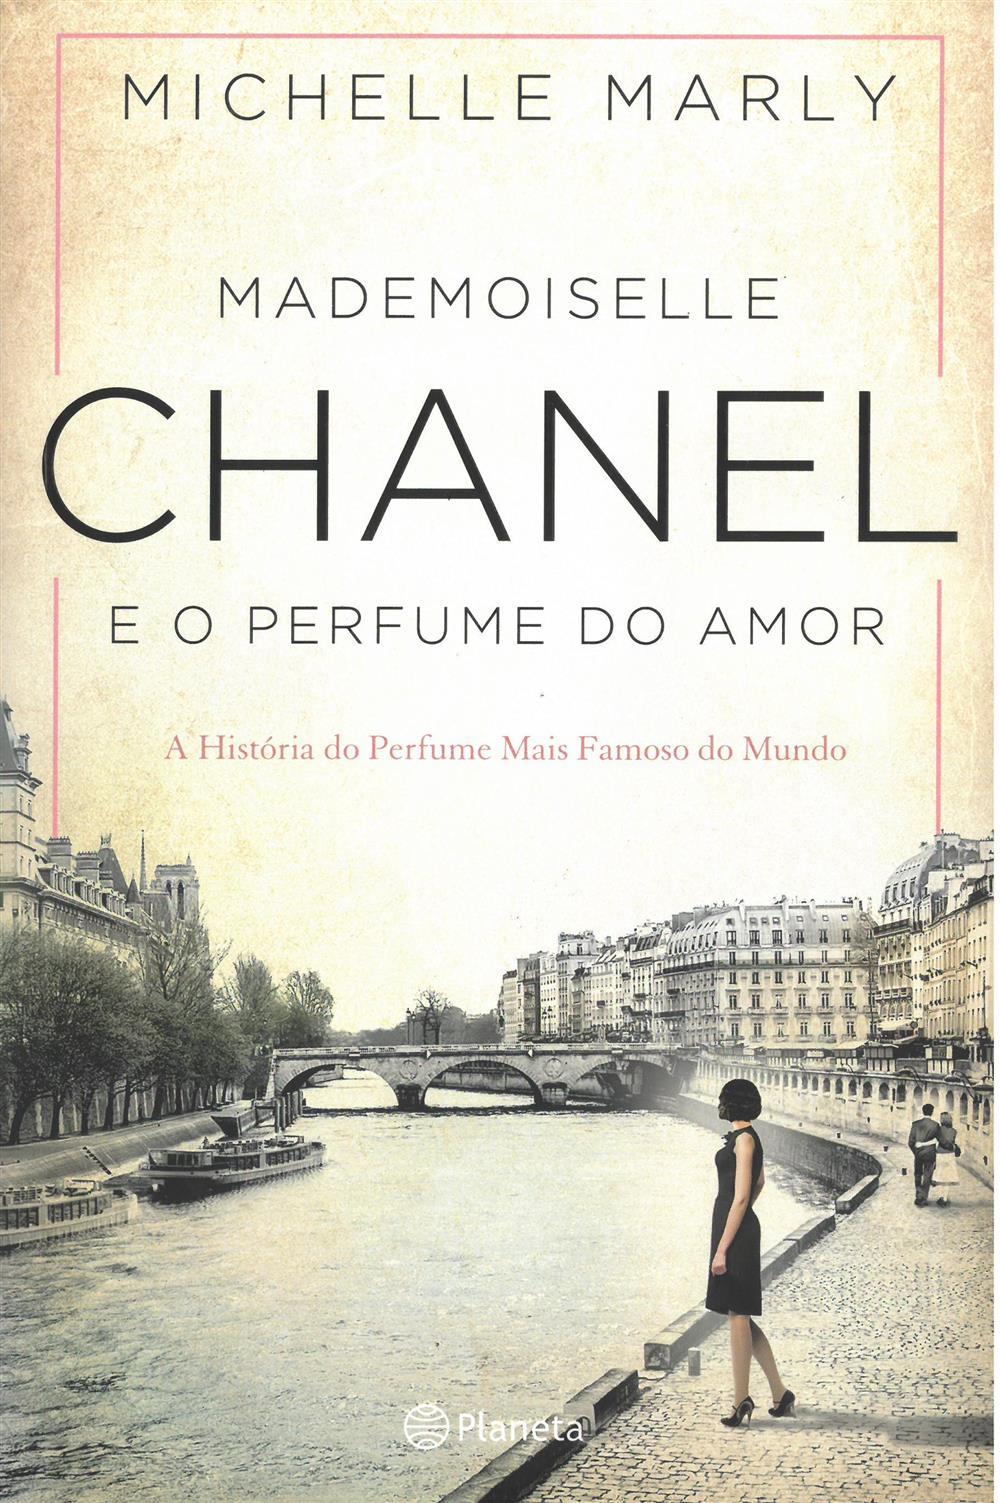 MARLY, Michelle (2021). Mademoiselle Chanel e o perfume do amor.jpg